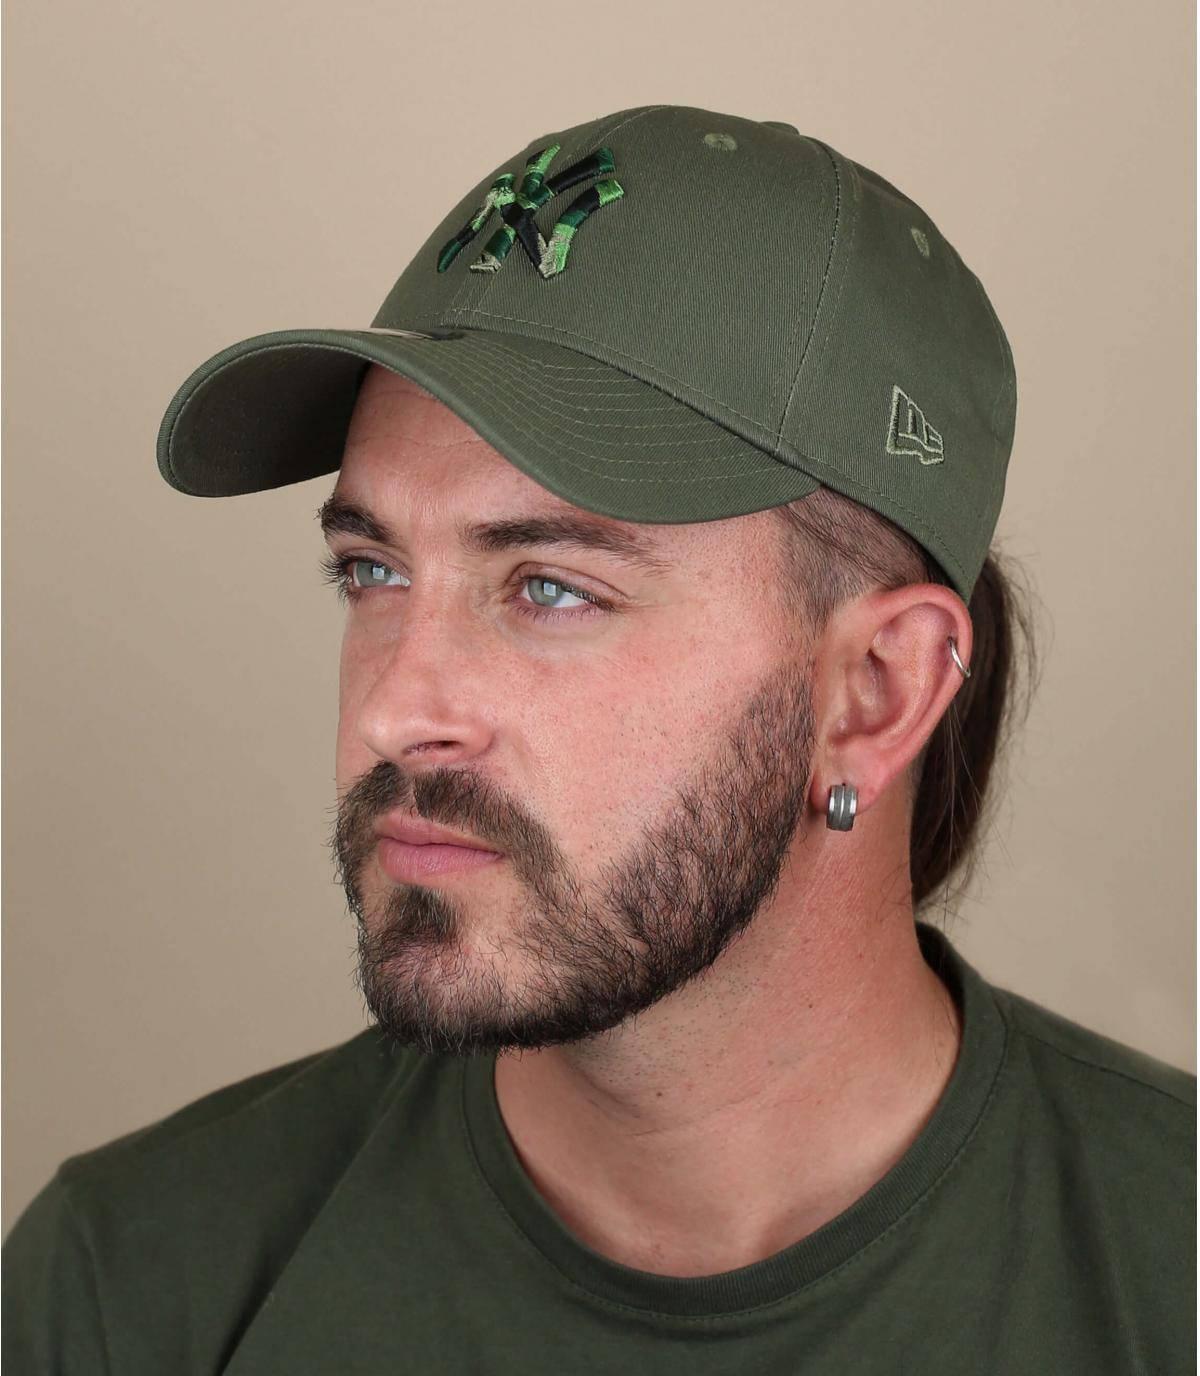 Gorra NY camuflaje verde